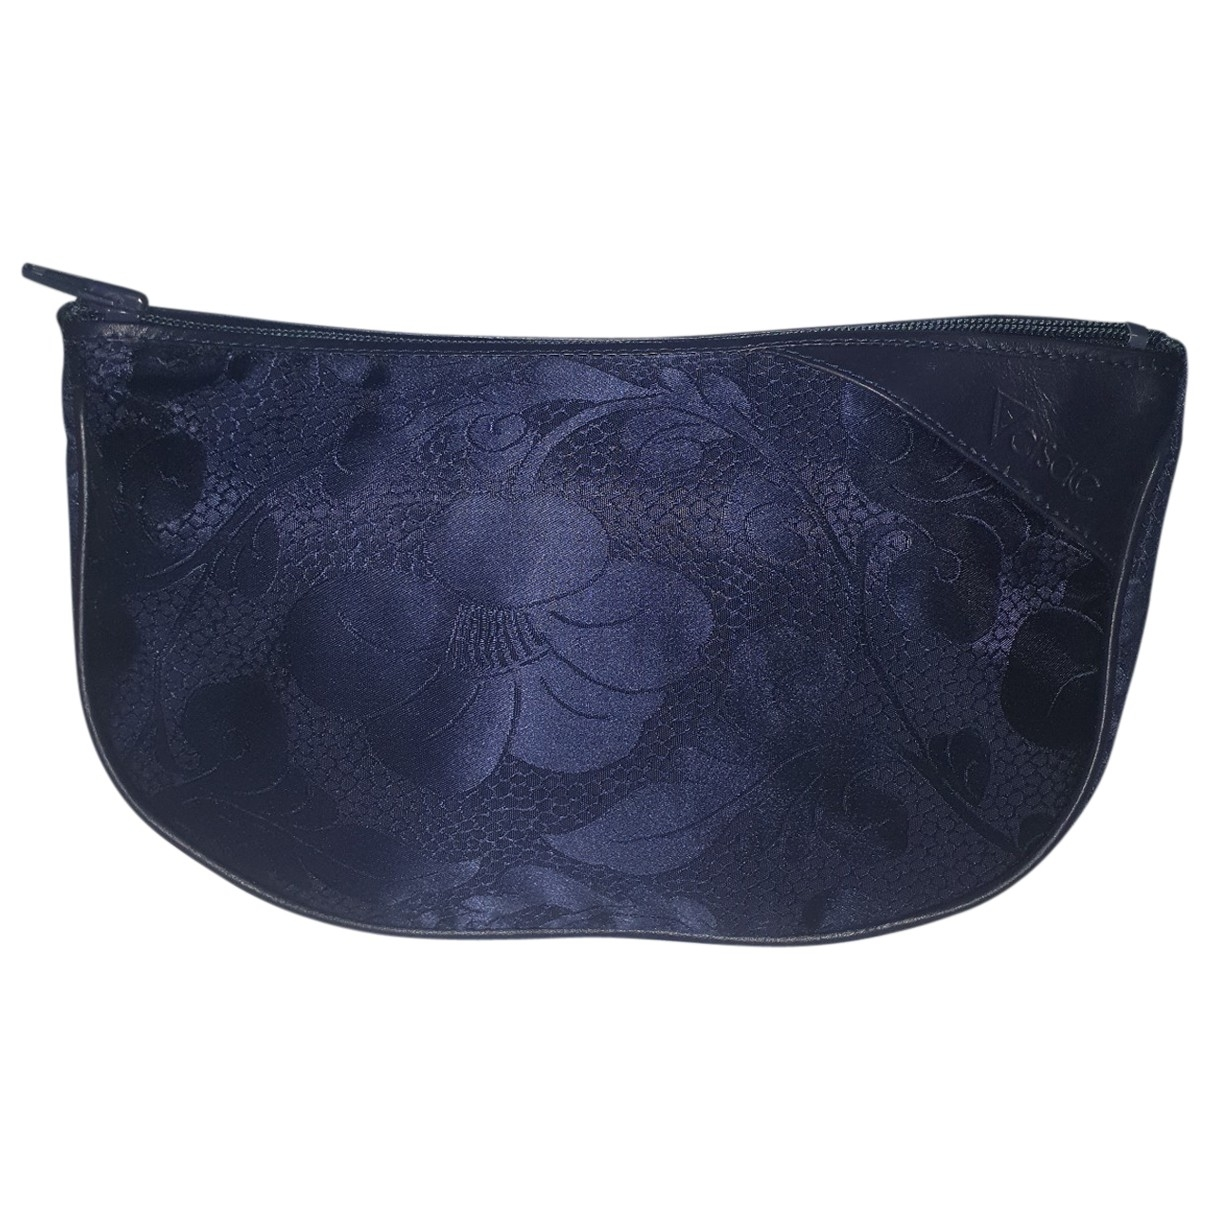 Gianni Versace \N Blue Cloth Clutch bag for Women \N